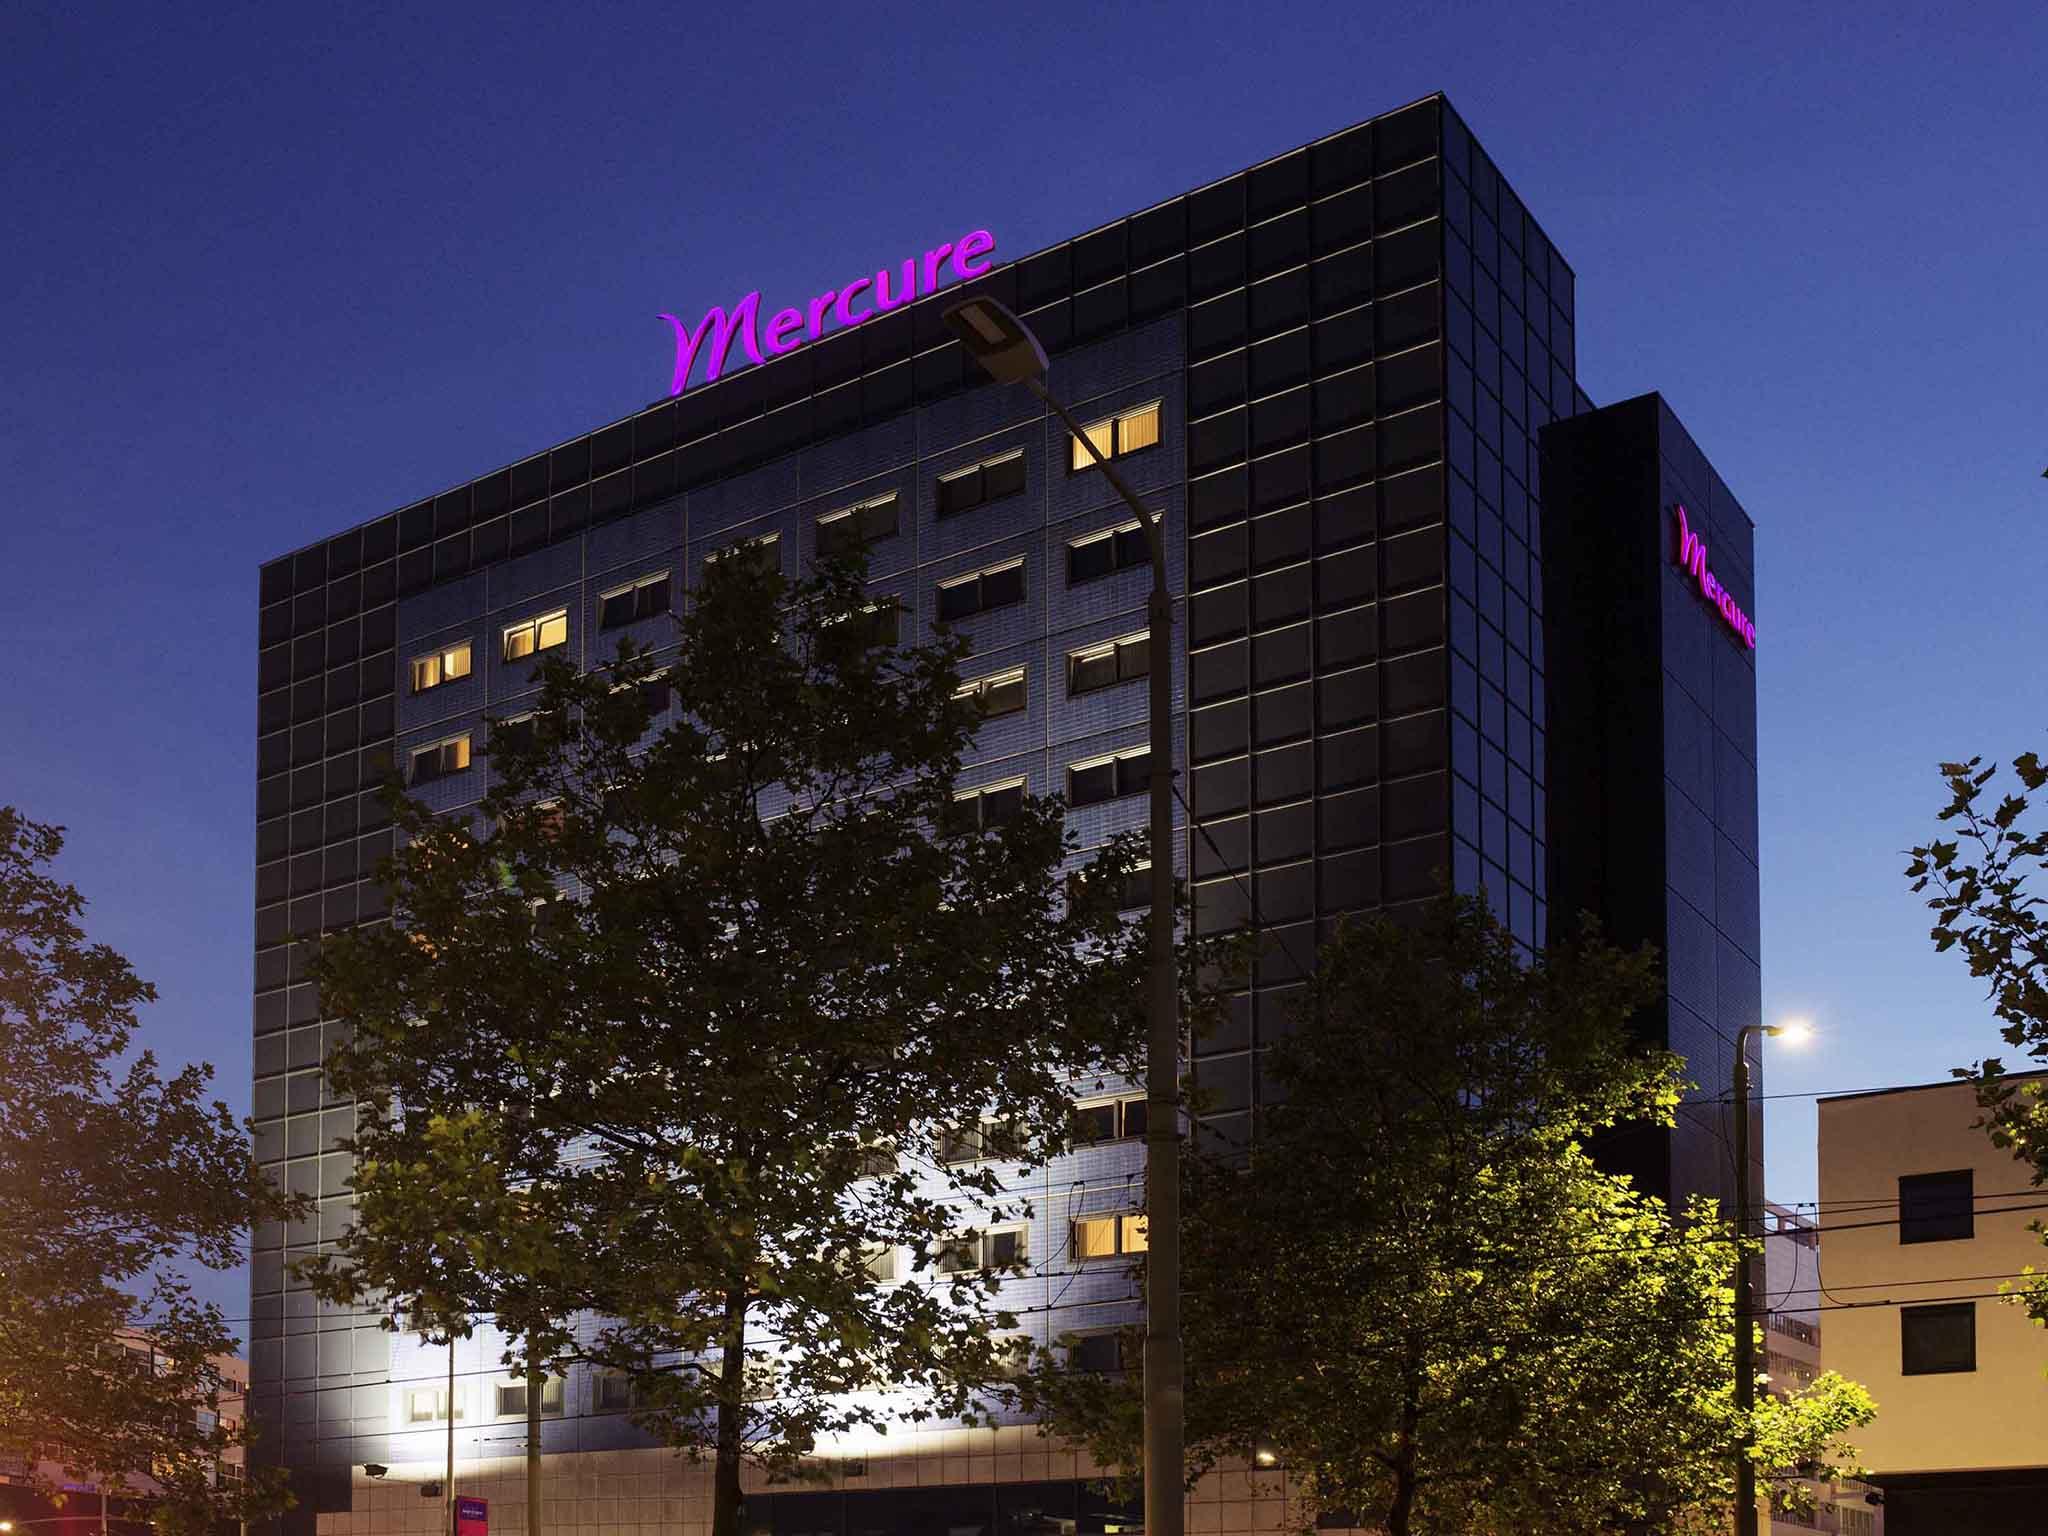 فندق - فندق مركيور Mercure دين هاج سنترال